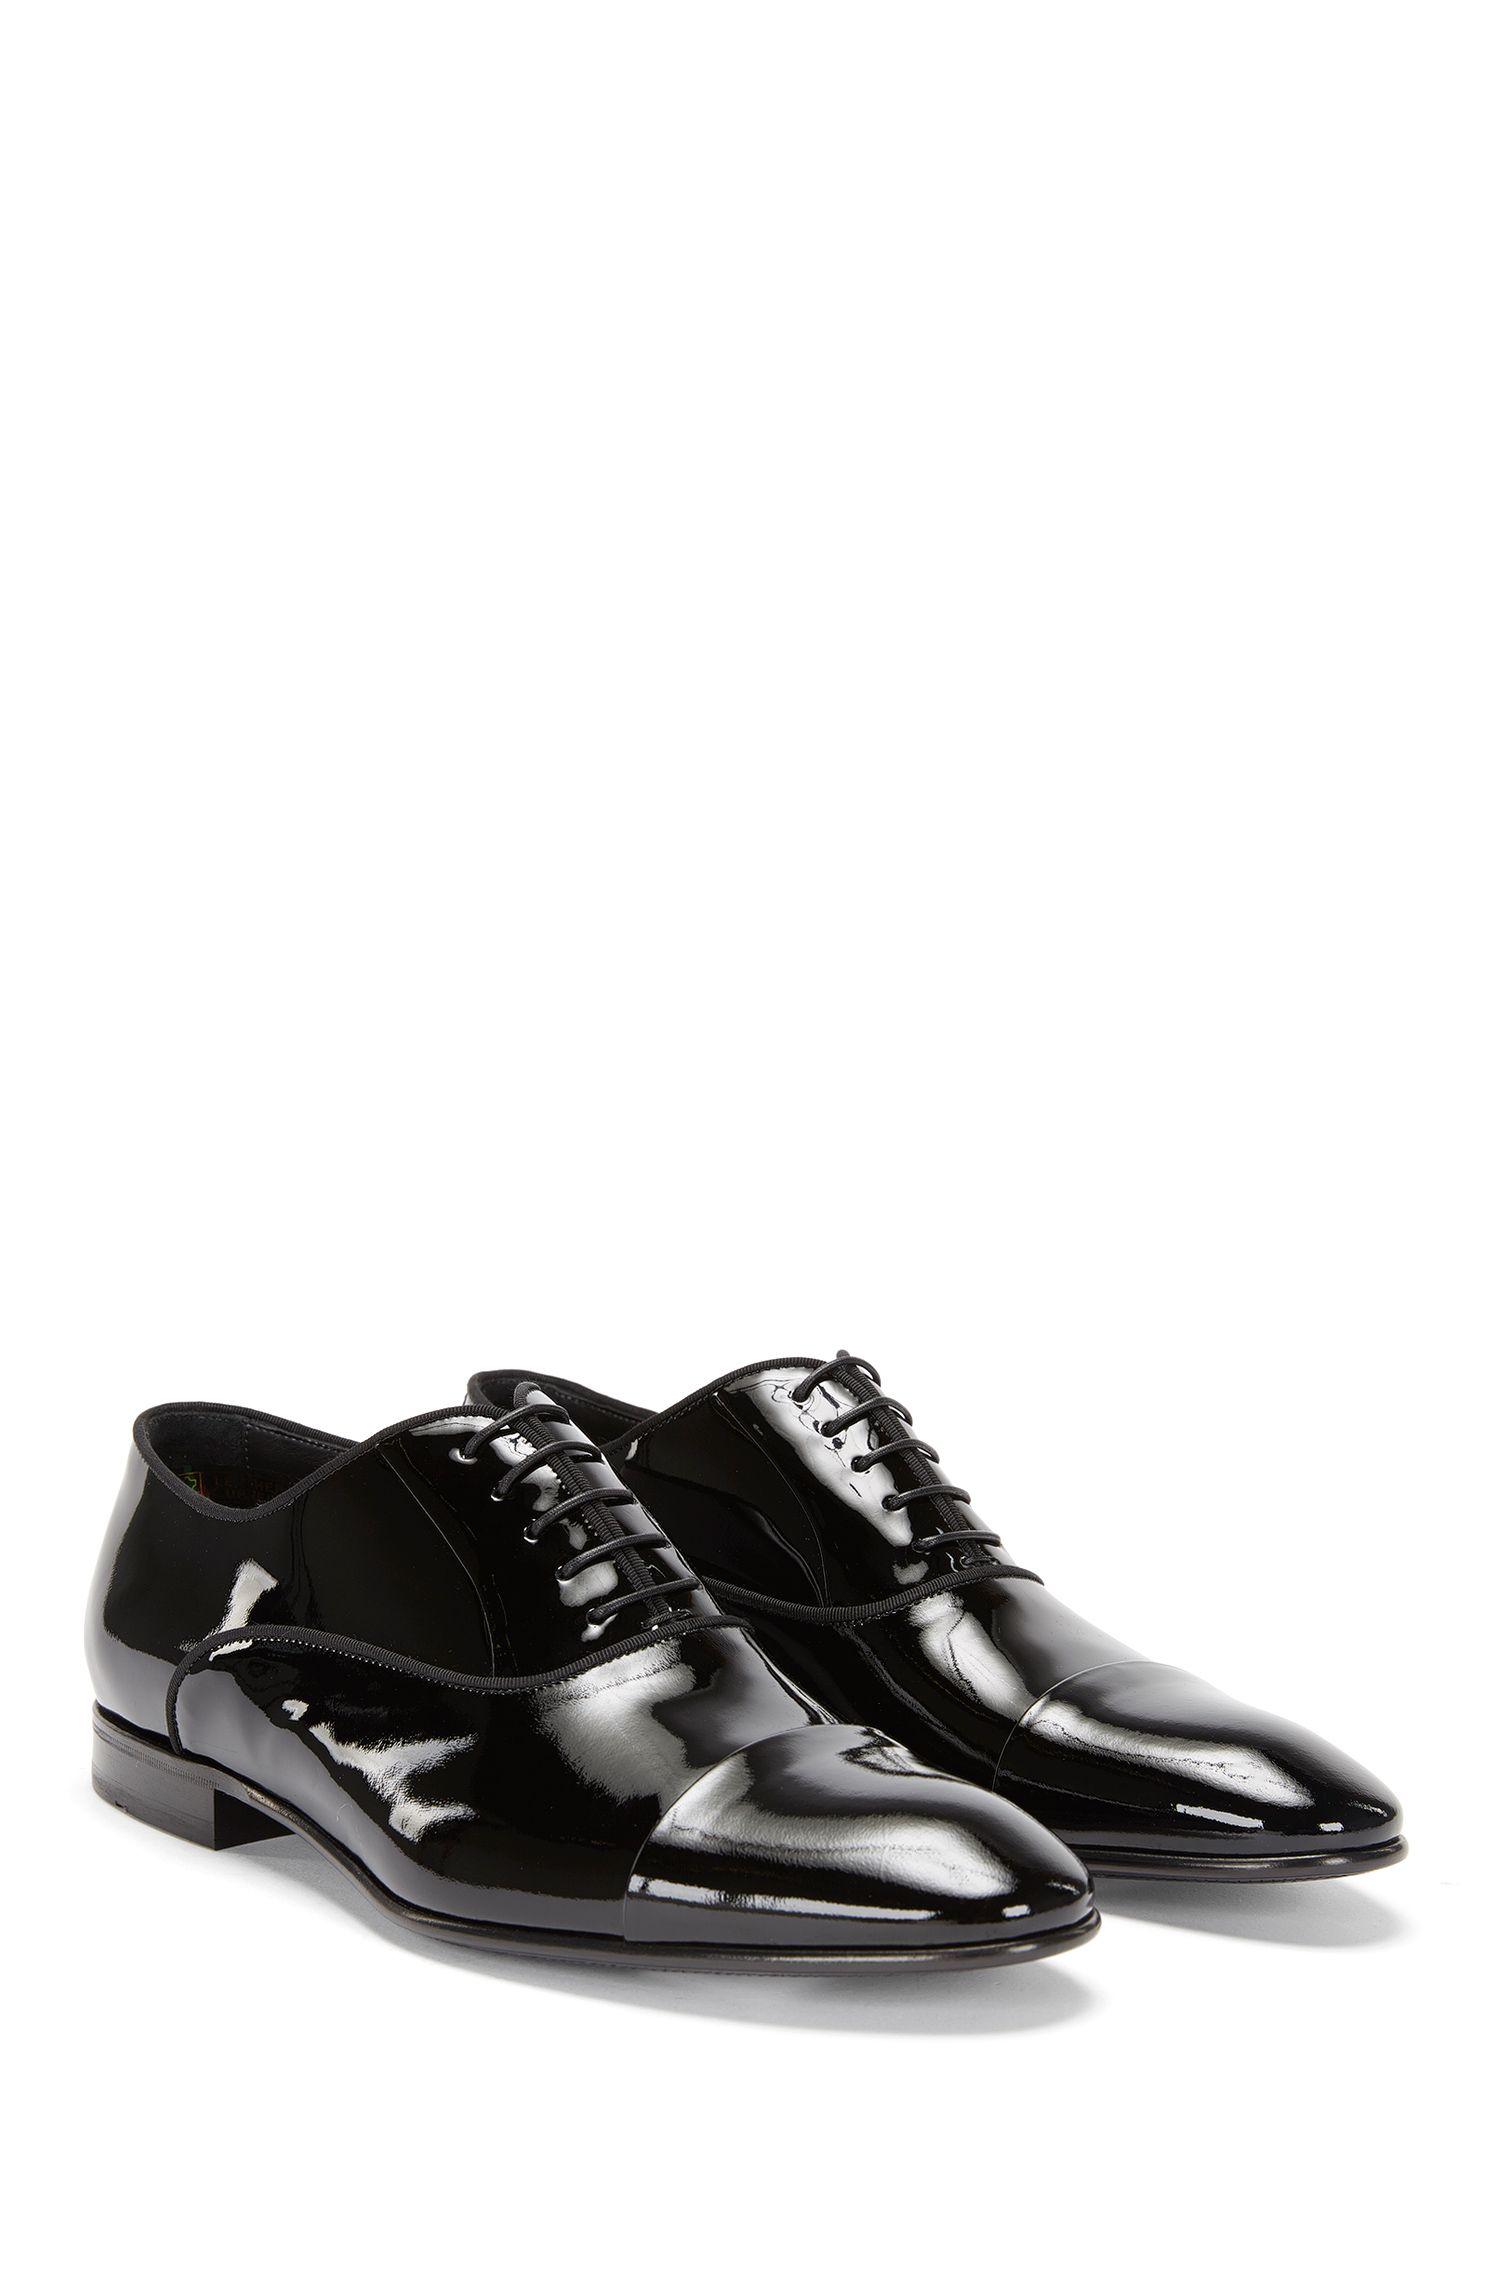 'Evening Oxfr Patct' | Italian Patent Calfskin Cap Toe Oxford Dress Shoes